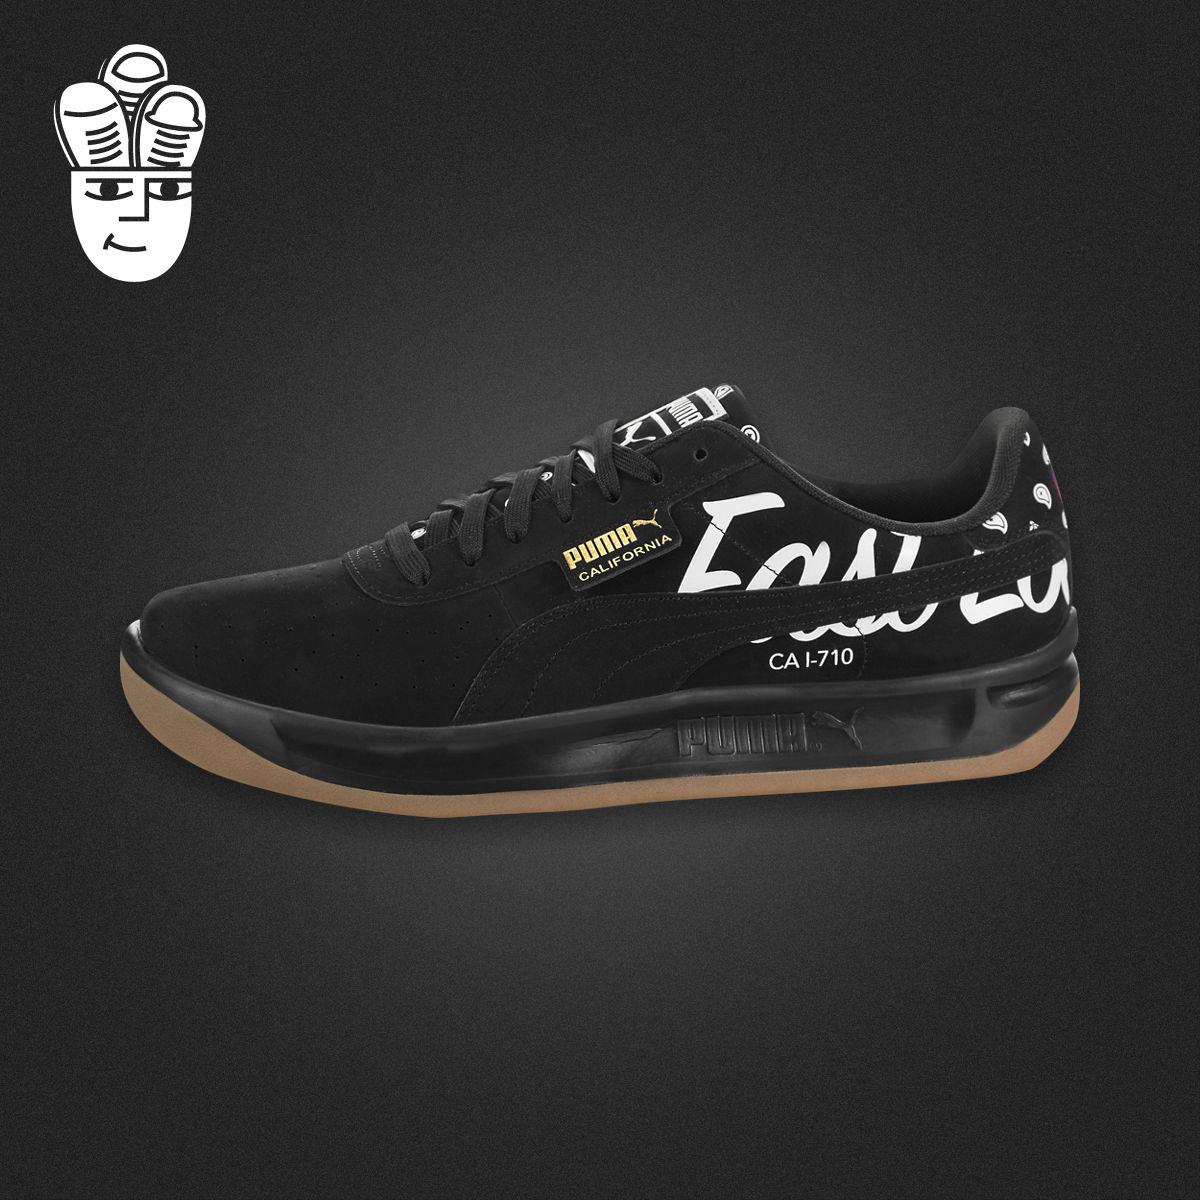 Puma California East LA 彪马男子休闲鞋 复古经典运动鞋